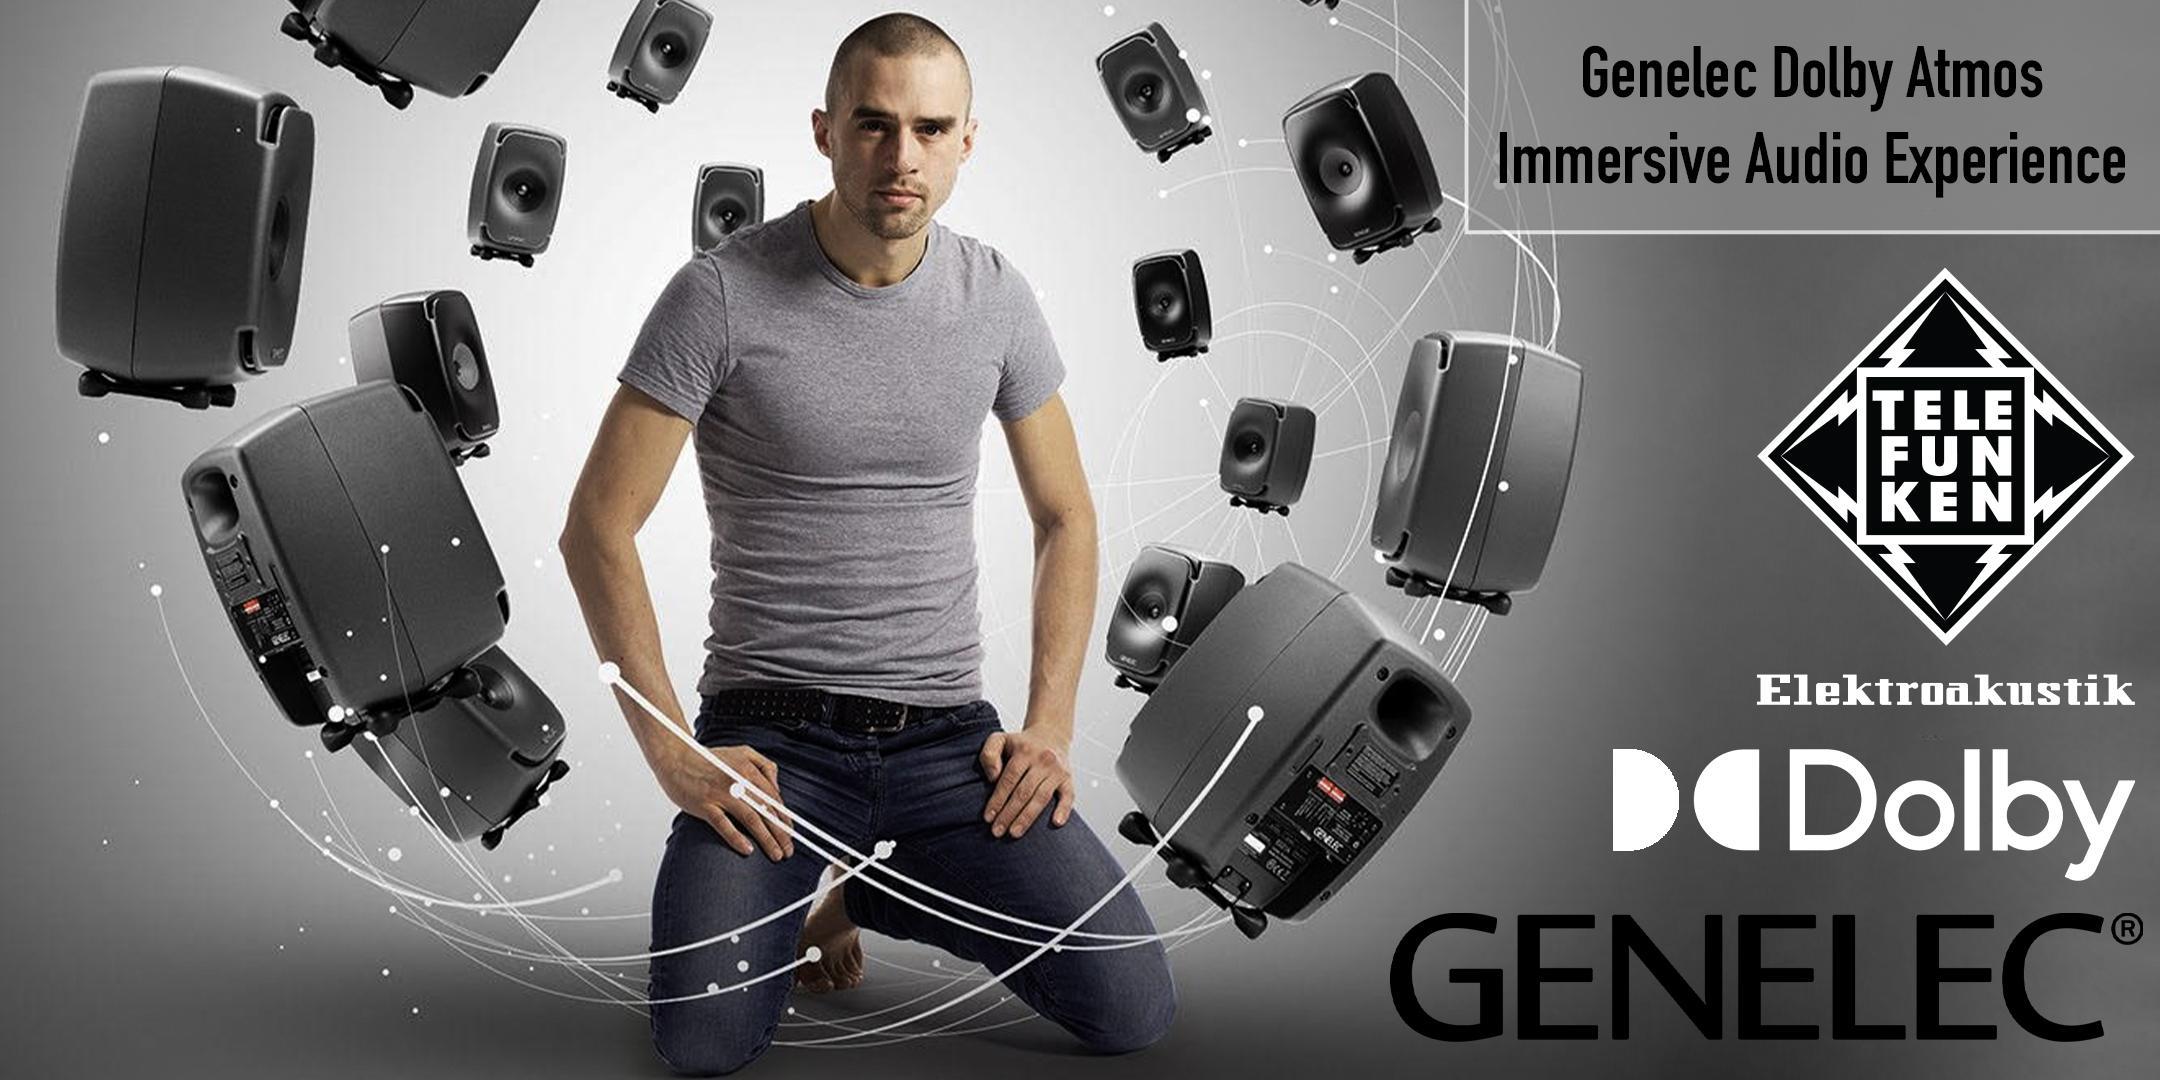 TELEFUNKEN Genelec Dolby Atmos Immersive Audio Experience!!